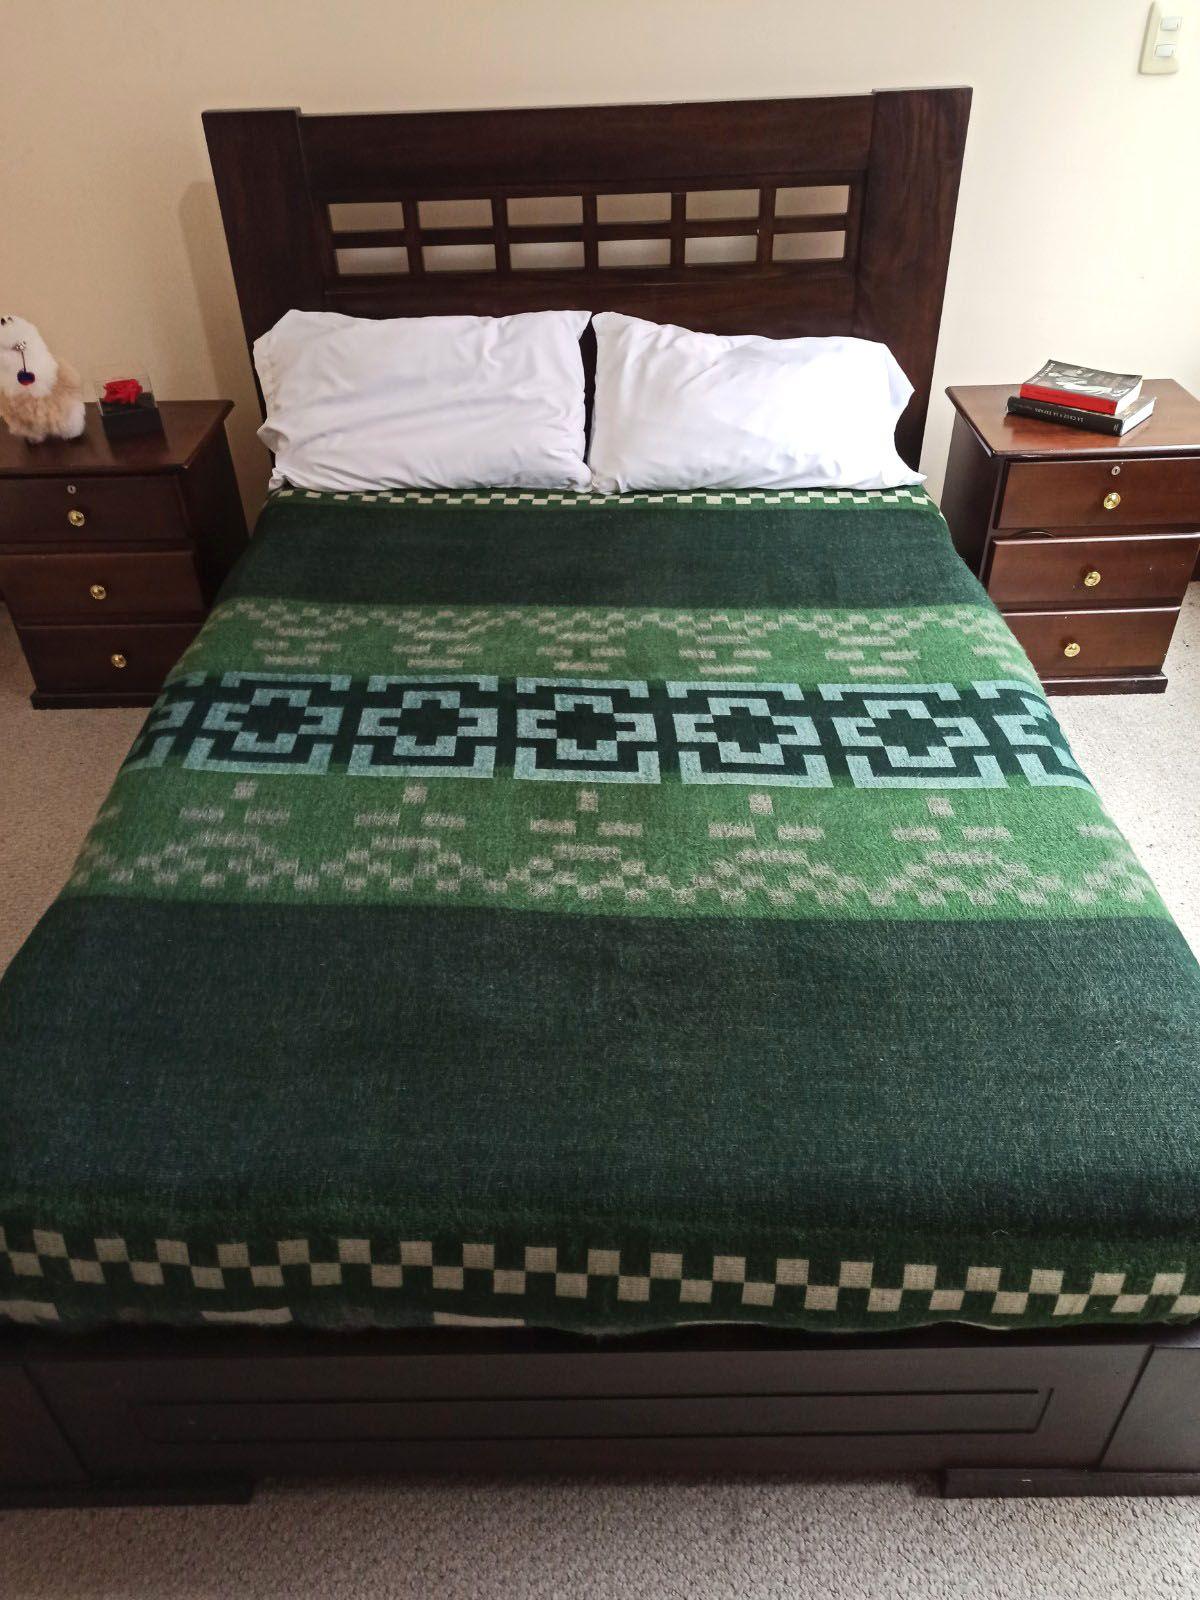 Ethnic Tribal Andean Artisan Green Alpaca Wool Fiber Blanket Gift